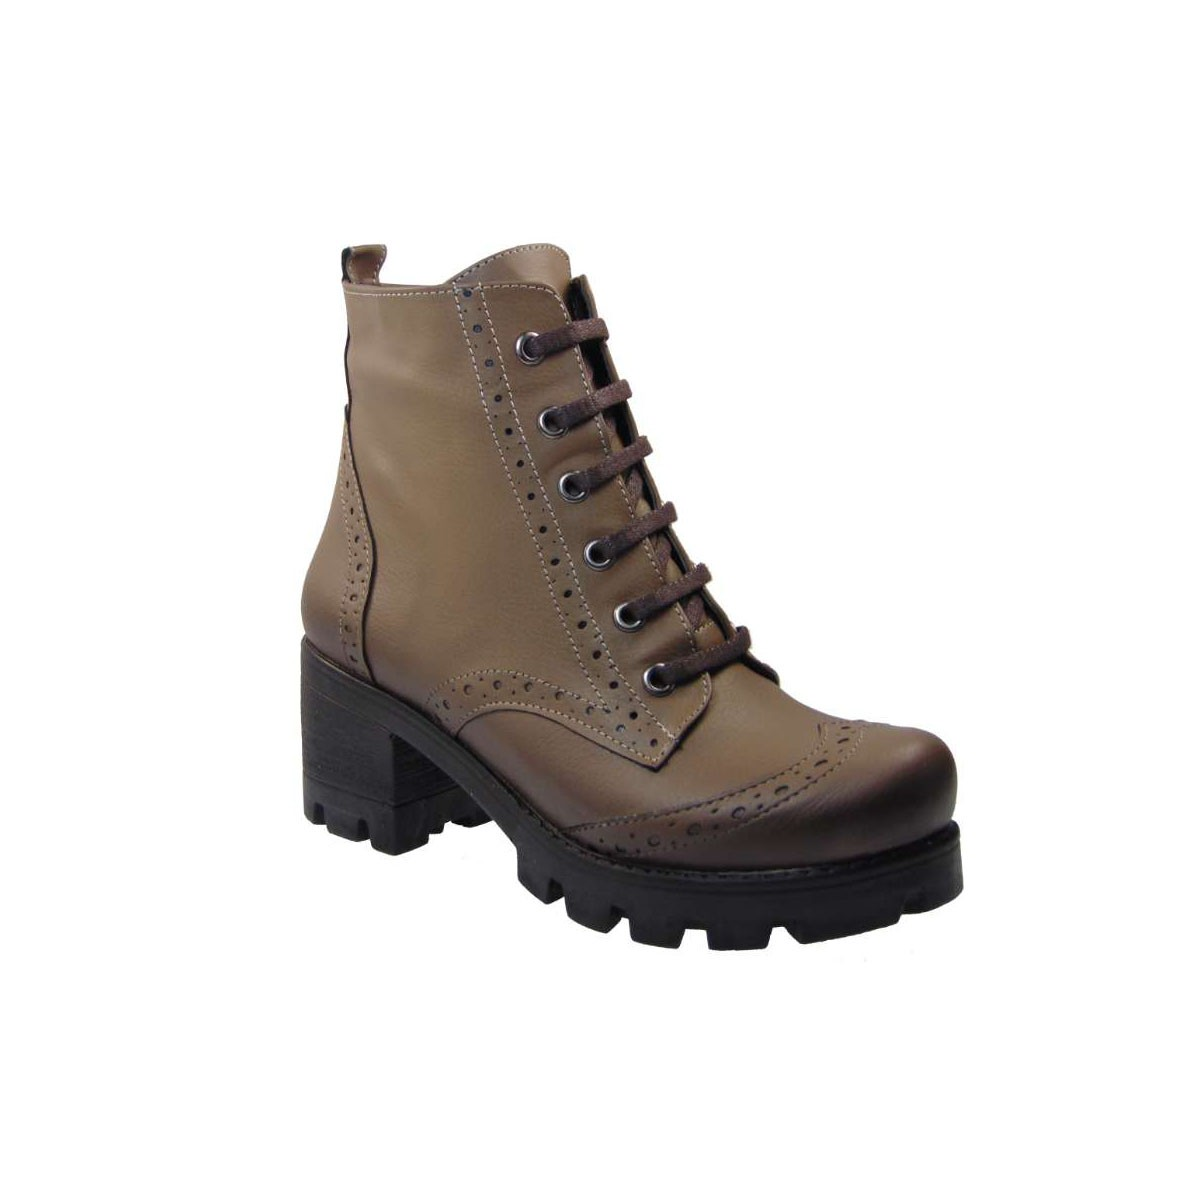 Tsimpolis Shoes 0107 Oxford Μποτάκι Απο Συνθετικό Αδιάβροχο Δέρμα Μπεζ